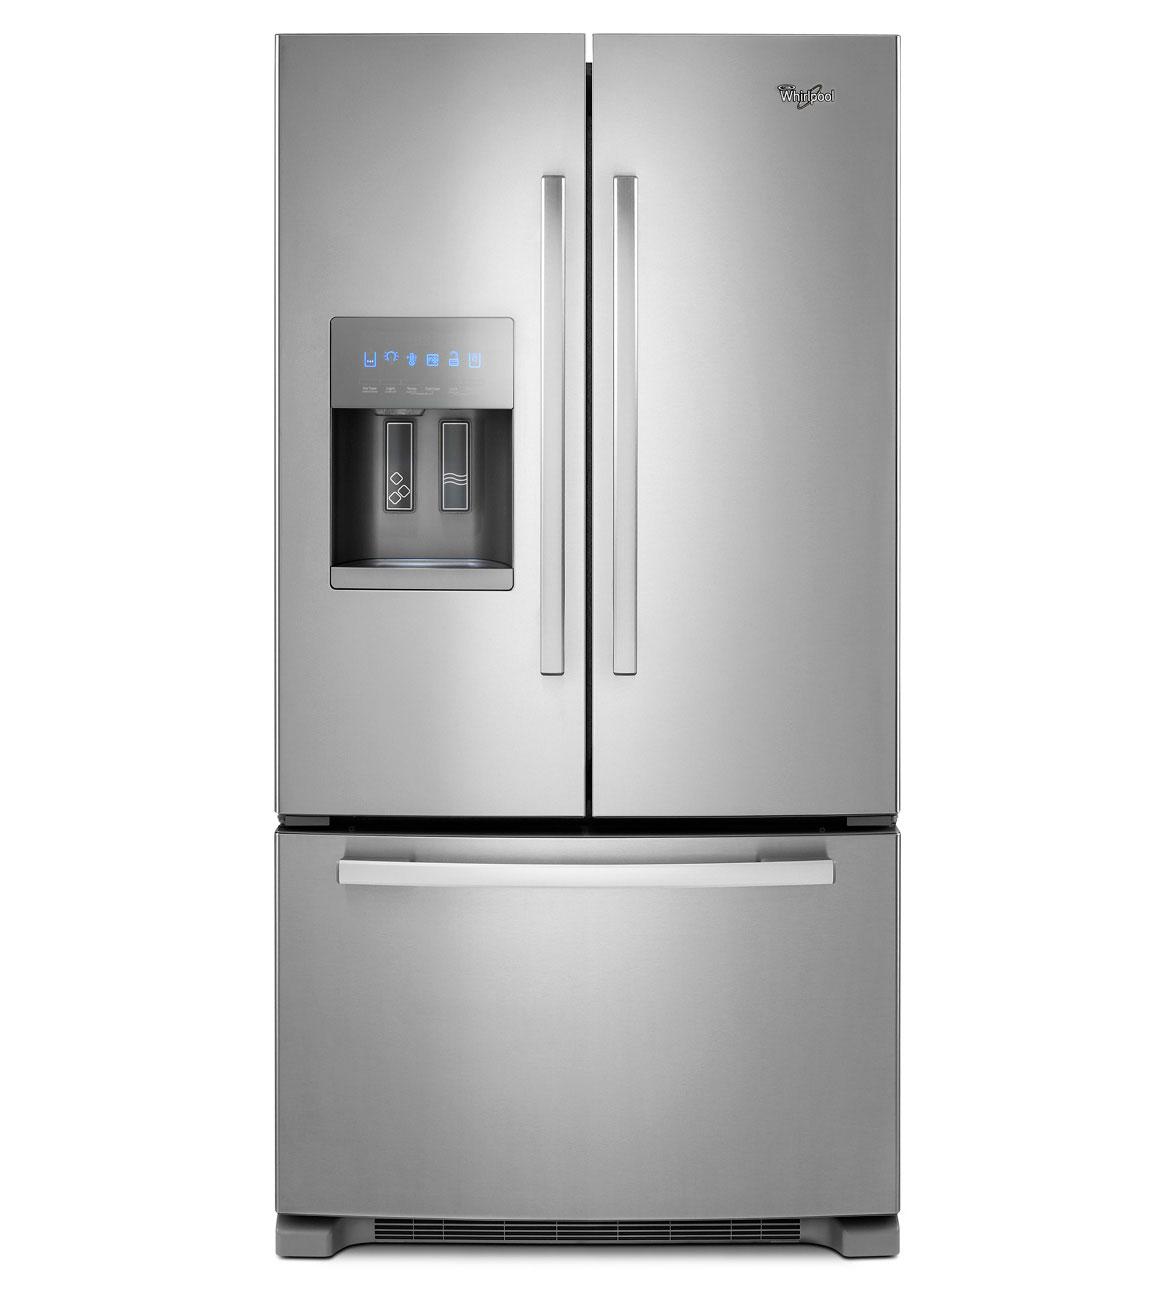 Dmv Refrigerator Repair Company In Silver Spring Maryland